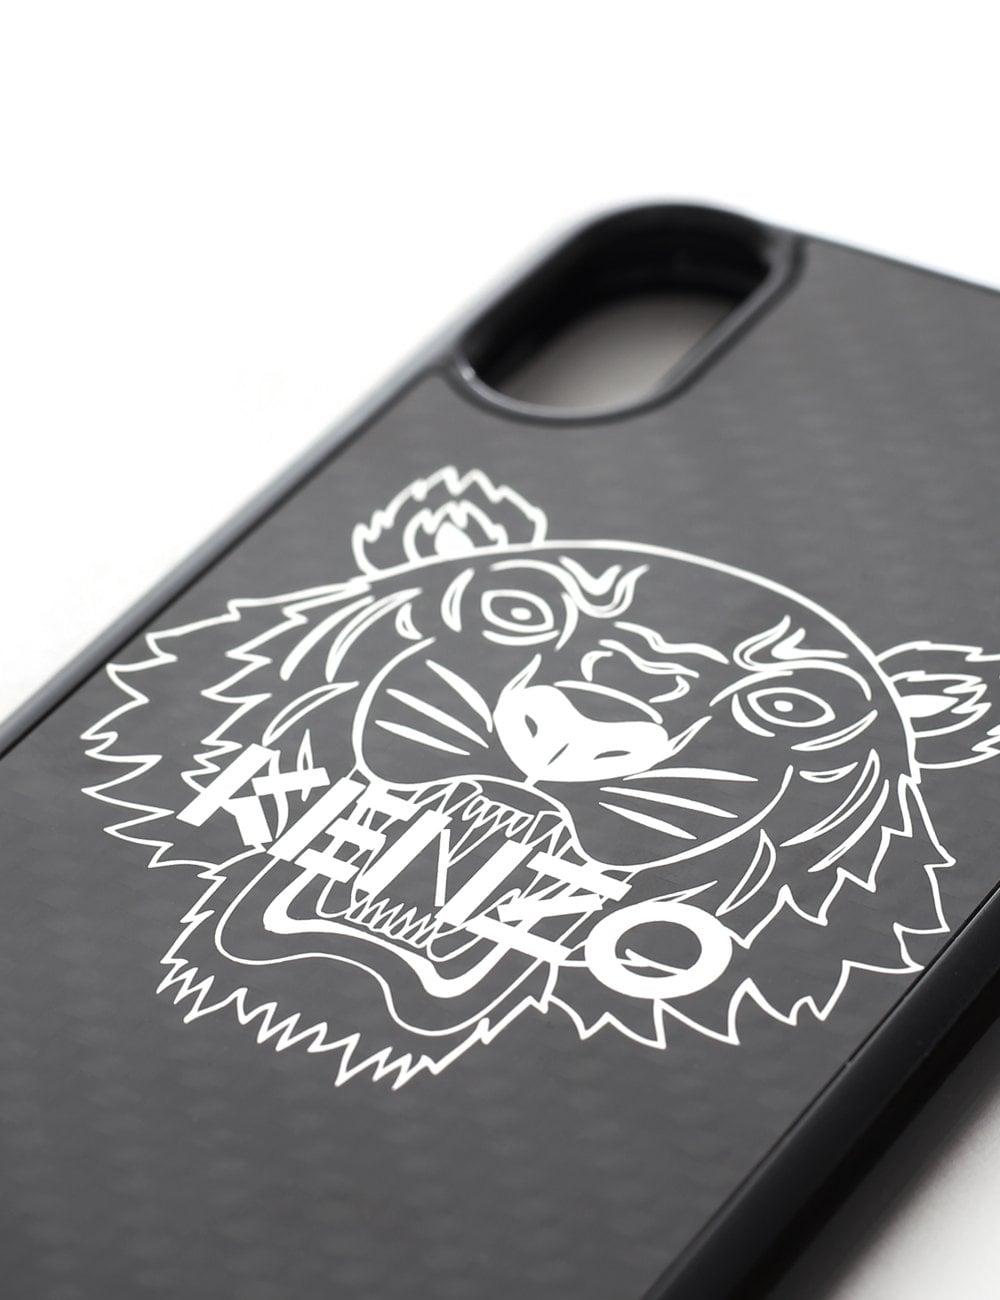 57f7114001 Kenzo Unisex Iphone X Phone Case